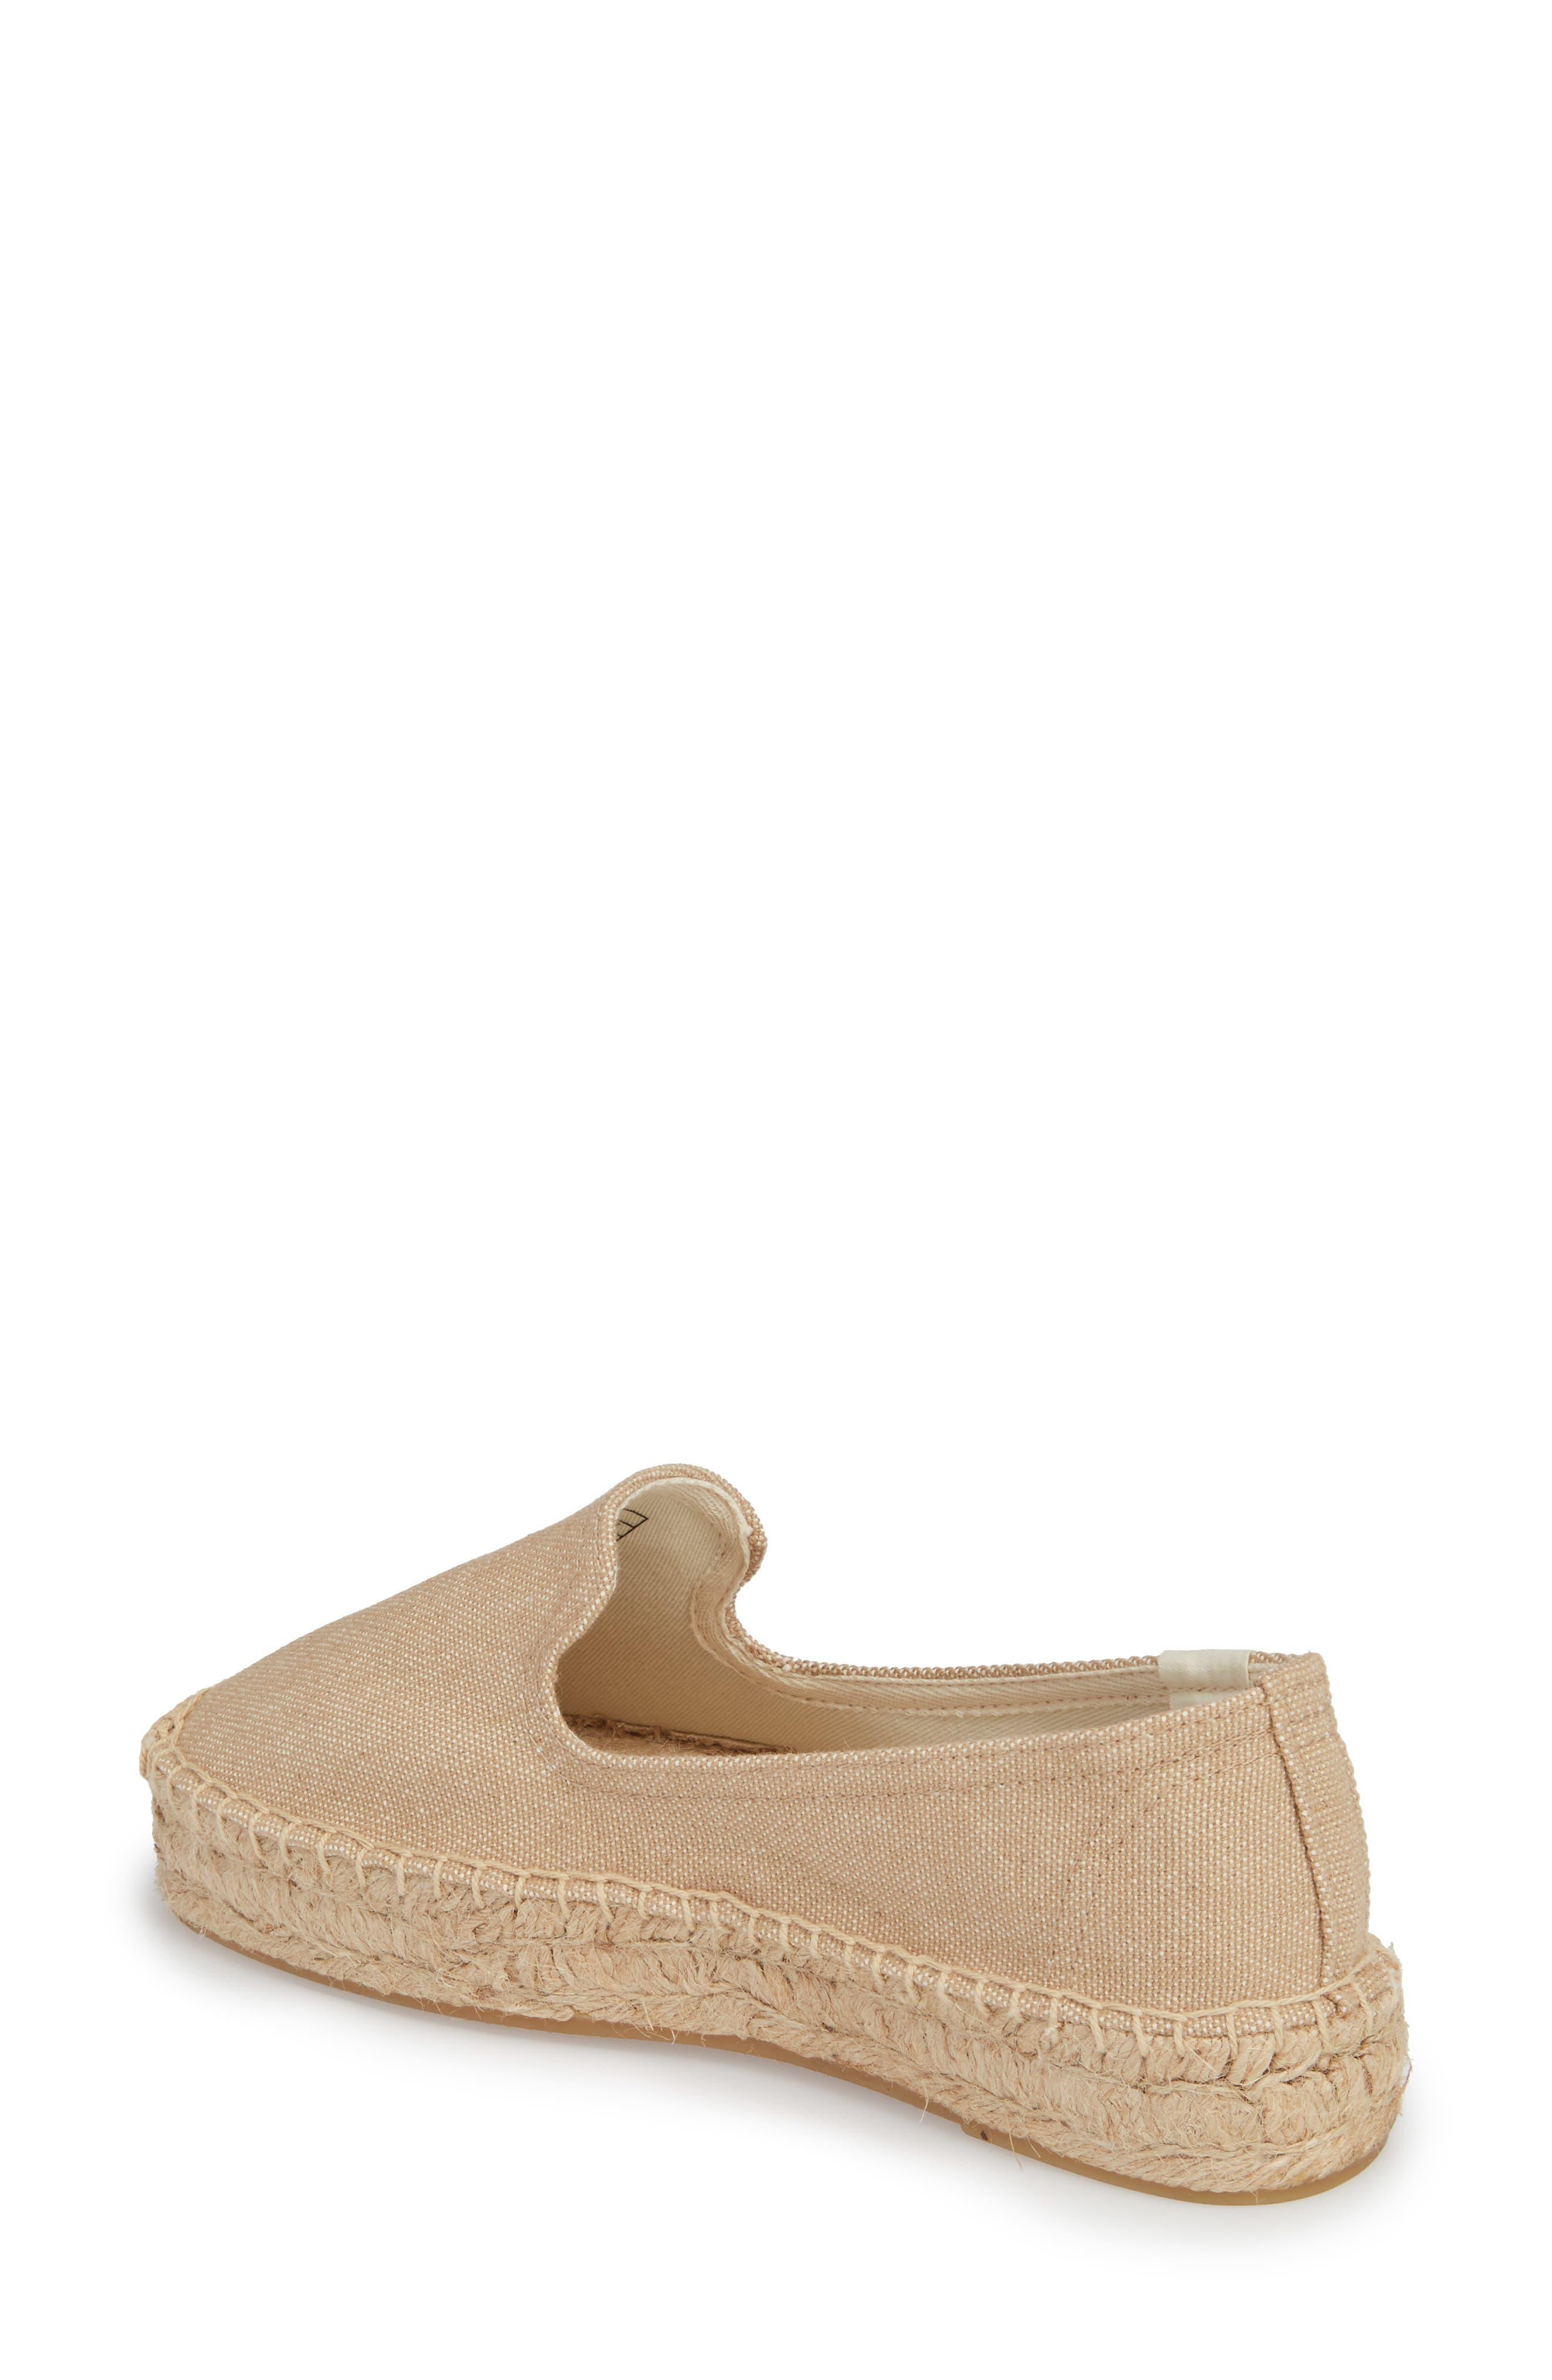 0494ec12c3 Soludos Shoes